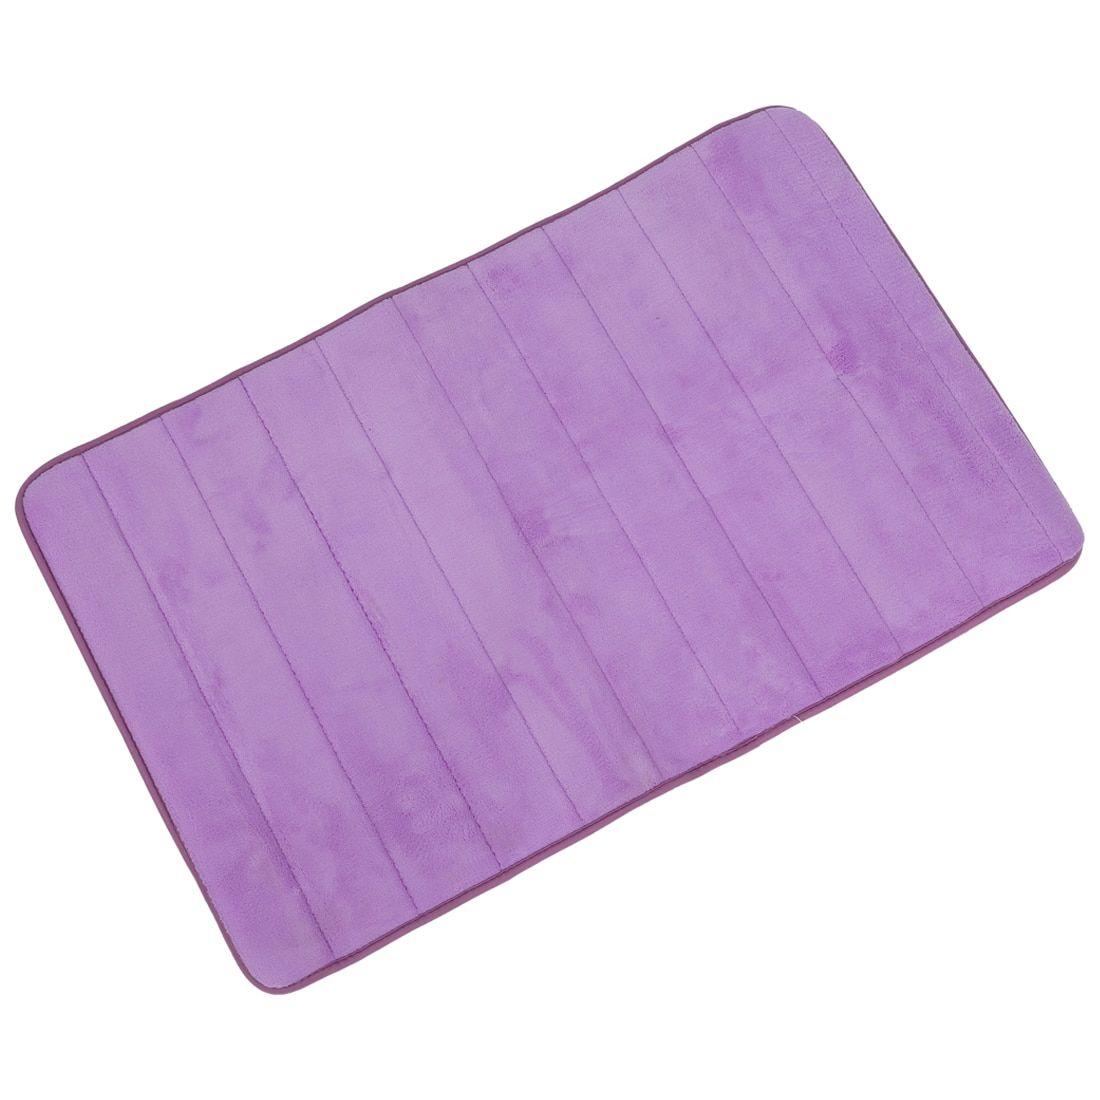 Universe Of Goods Buy Bath Mat Memory Foam Non Slip Bath Mats